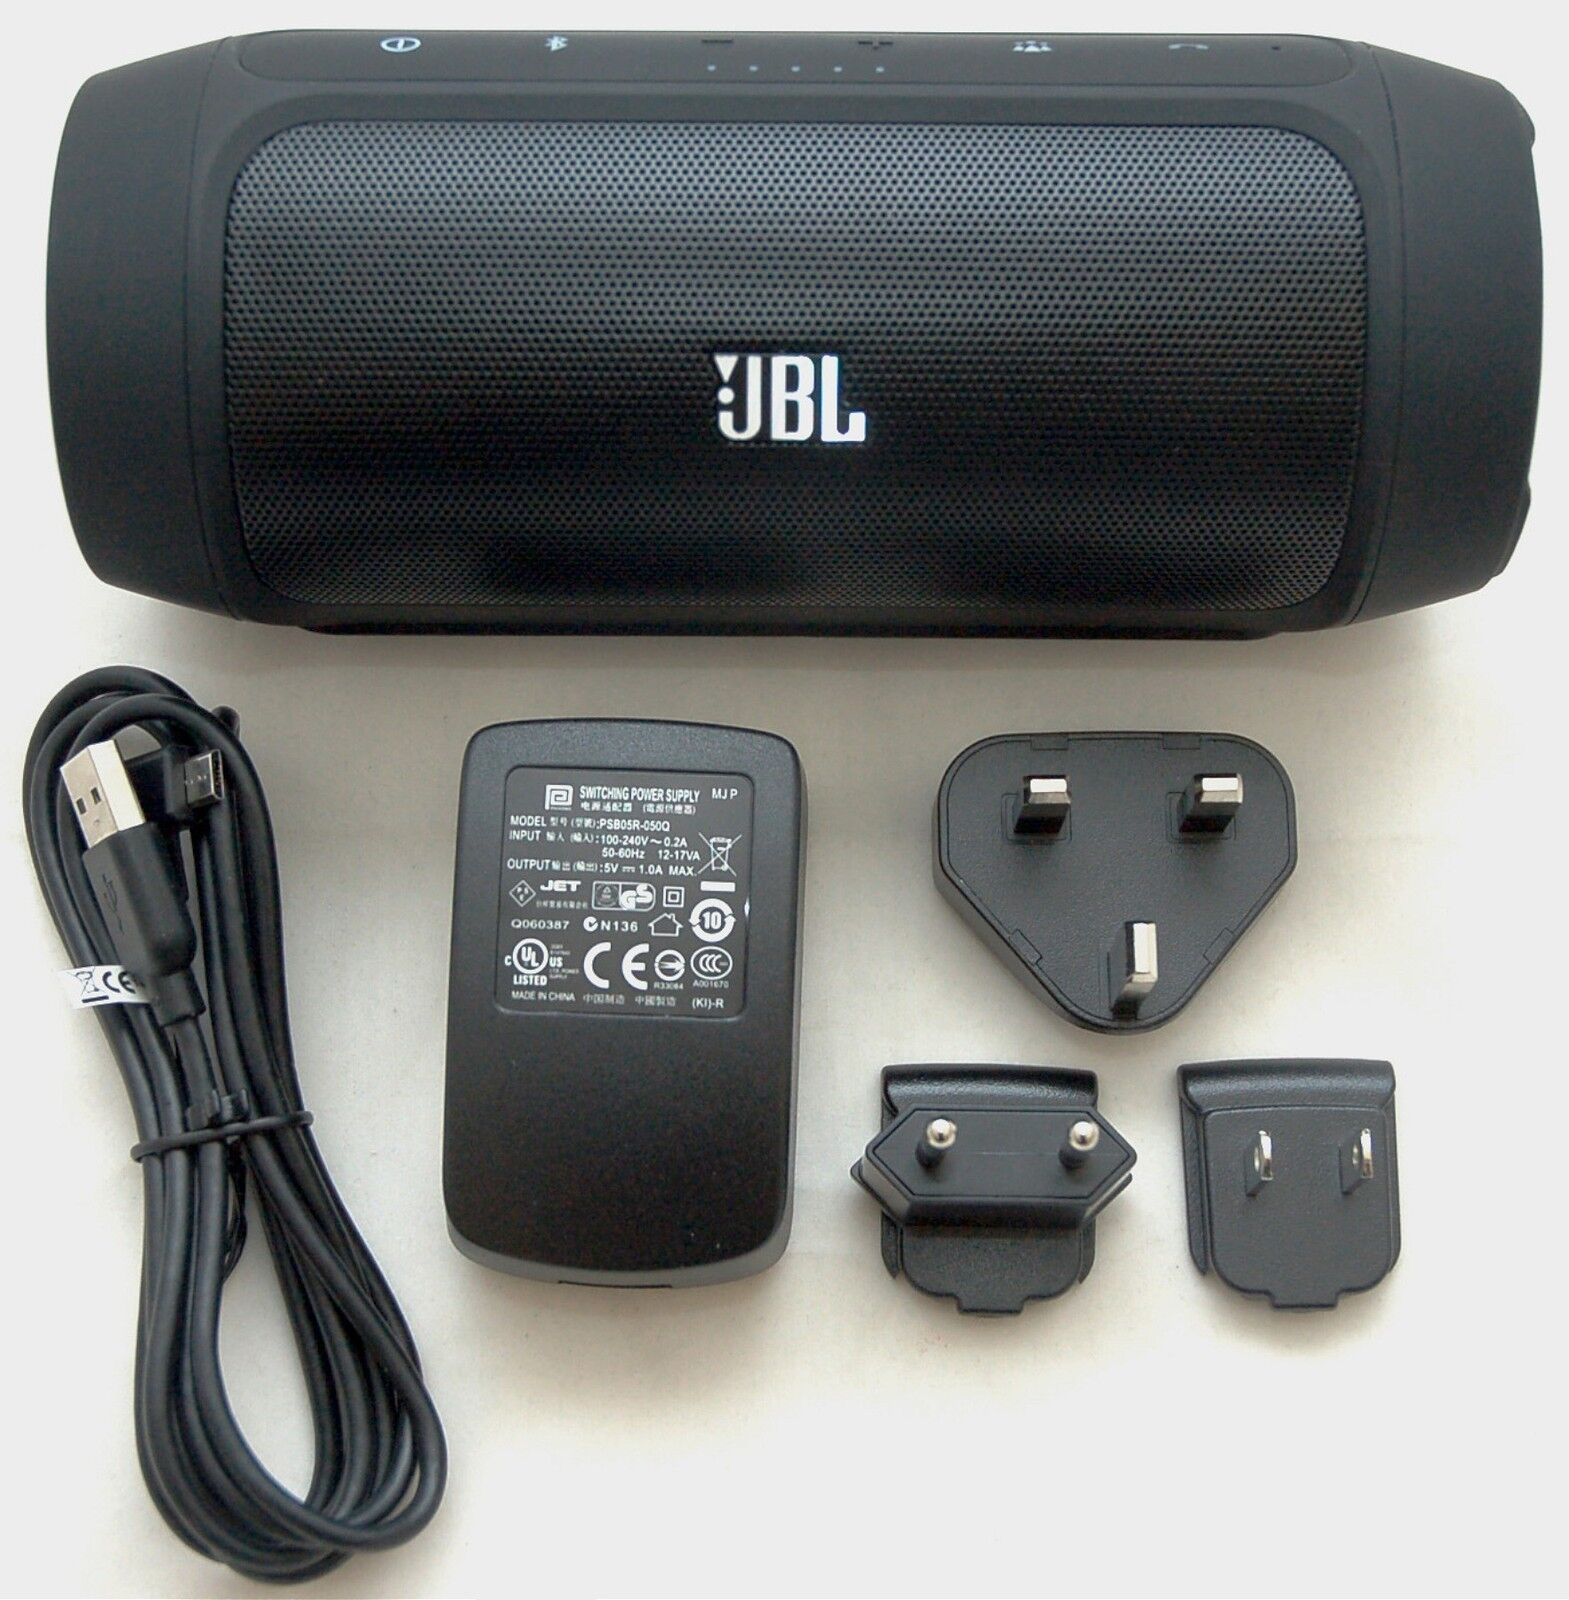 Portable Bluetooth Speaker Jbl Charge 2: JBL Charge 2 Black Portable Bluetooth Speaker Device Charger Passive Radiators 7353711933574